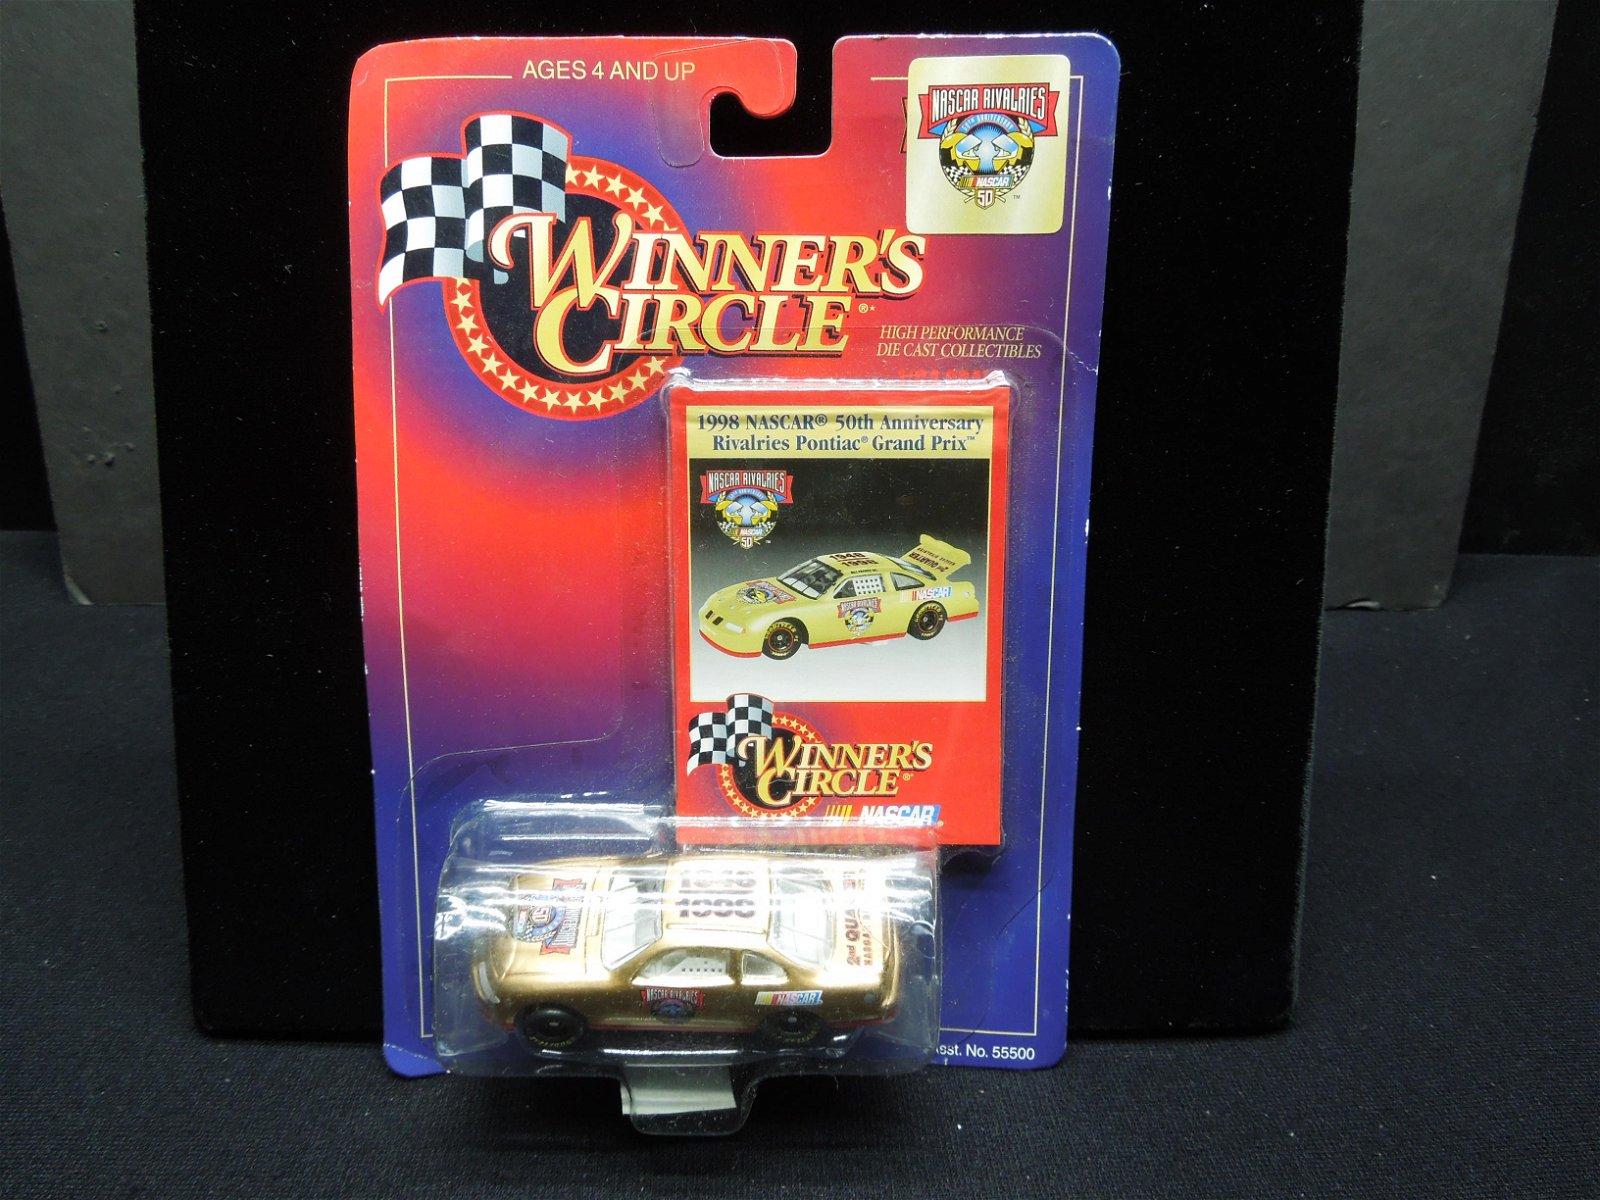 1998 50th Anniversary Rivalries Pontiac - Grand Prix -